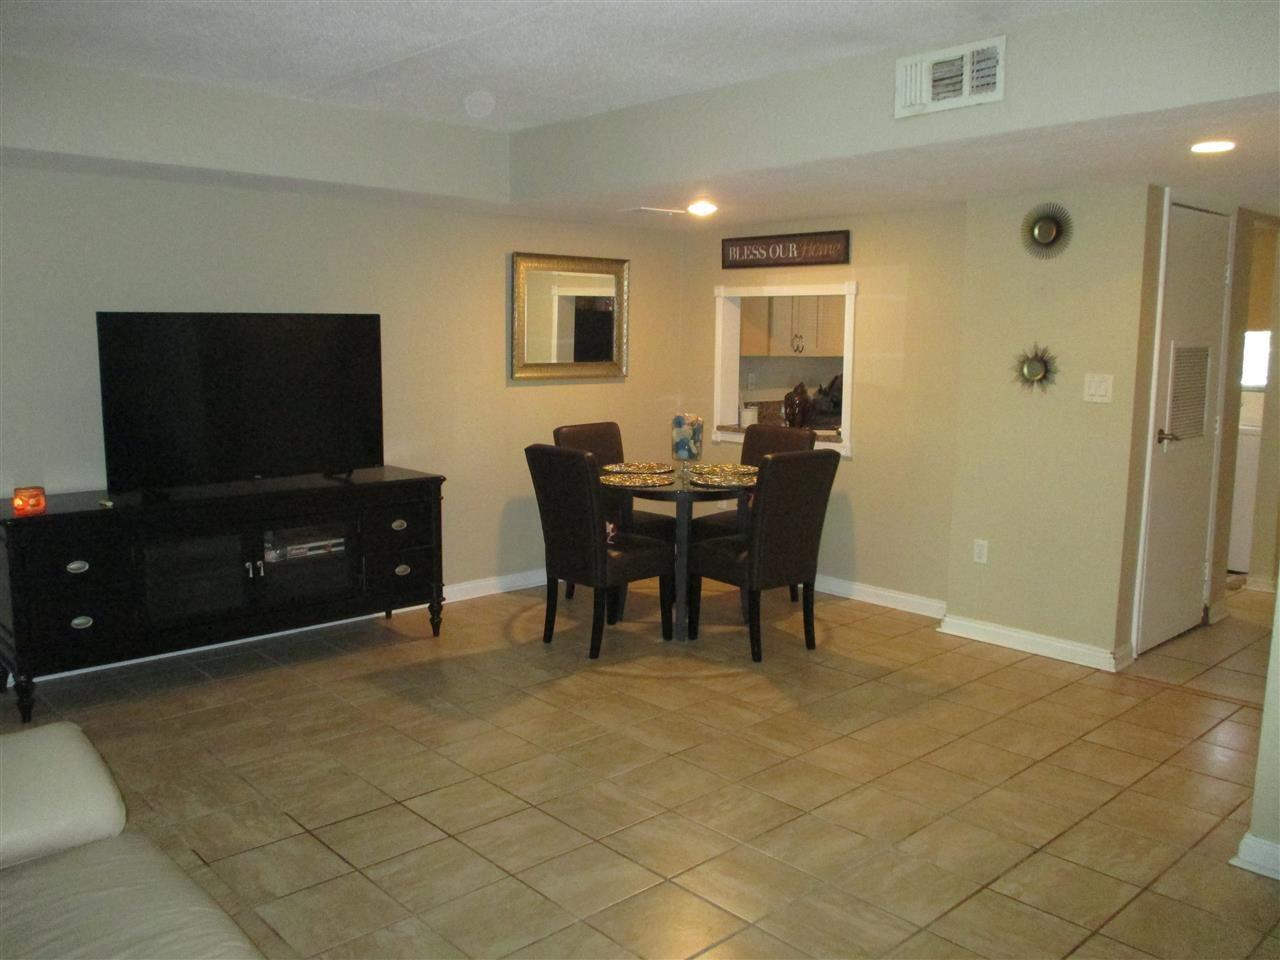 Photo of 2731 S Blair Stone Road #169, TALLAHASSEE, FL 32301 (MLS # 330708)